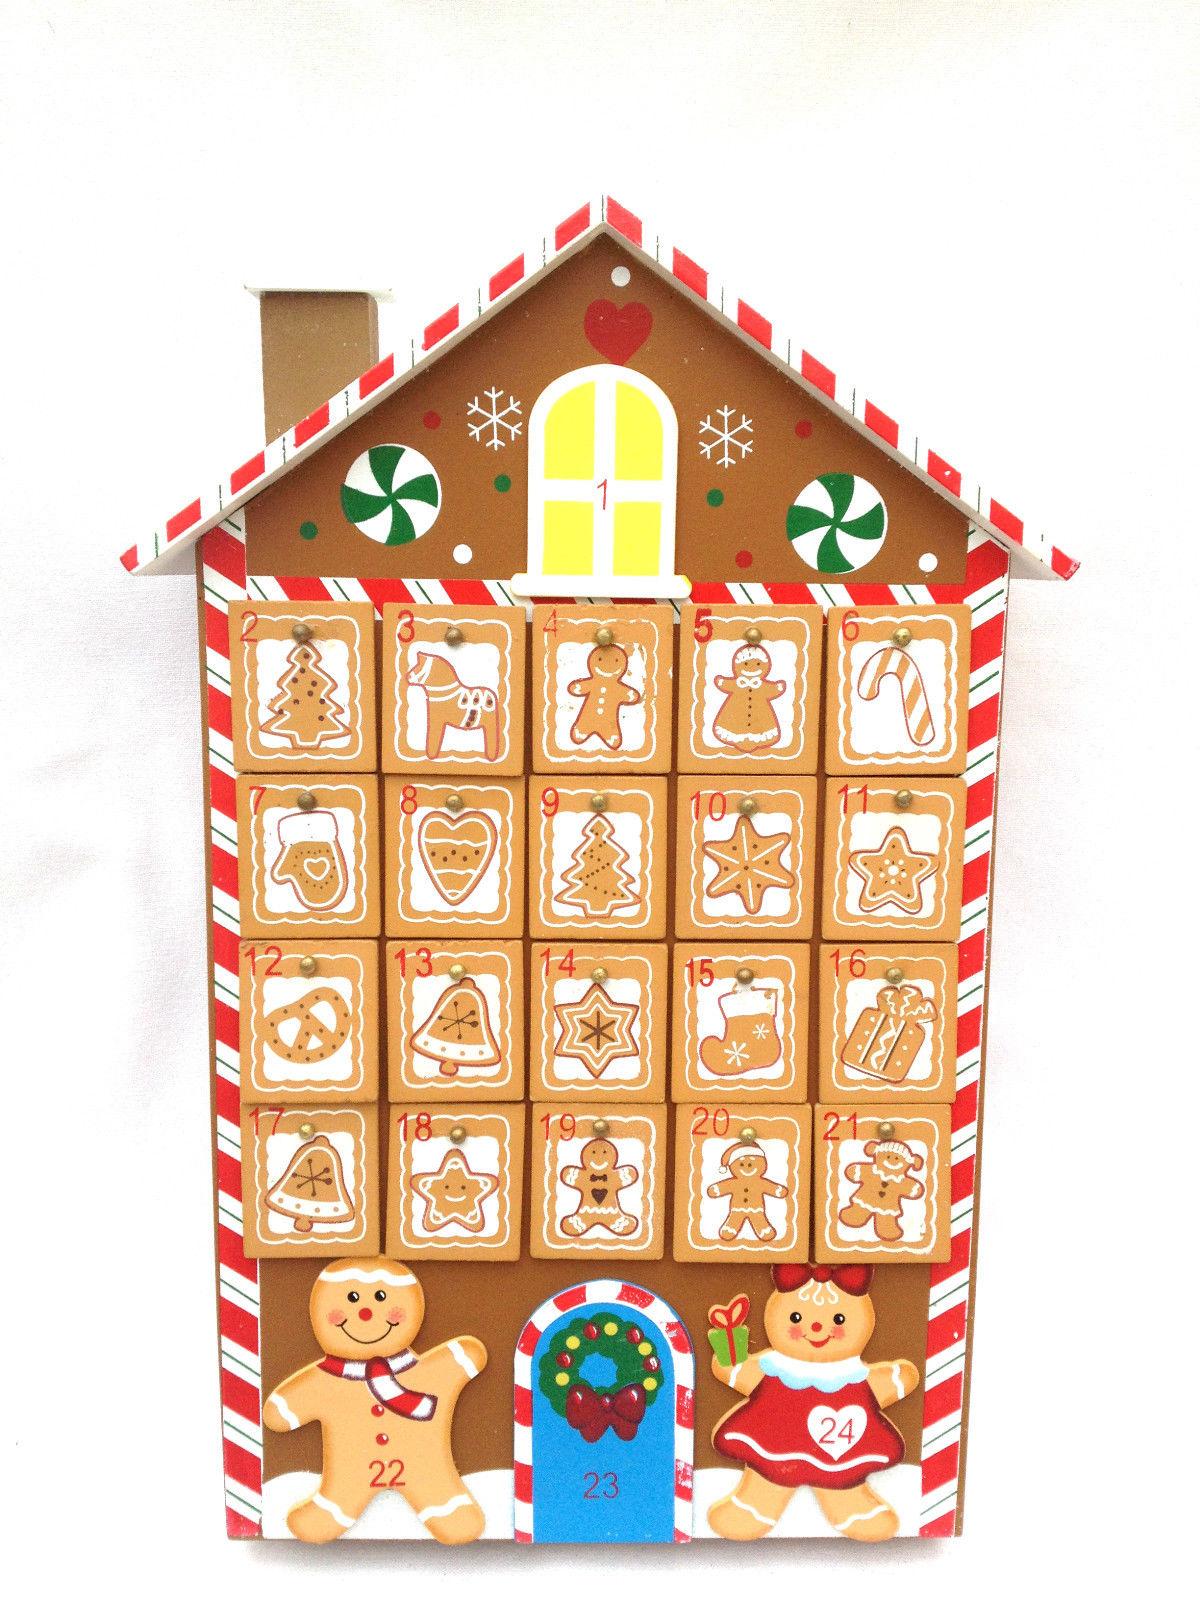 Kids Christmas Calendar : New large christmas children s wooden gingerbread man